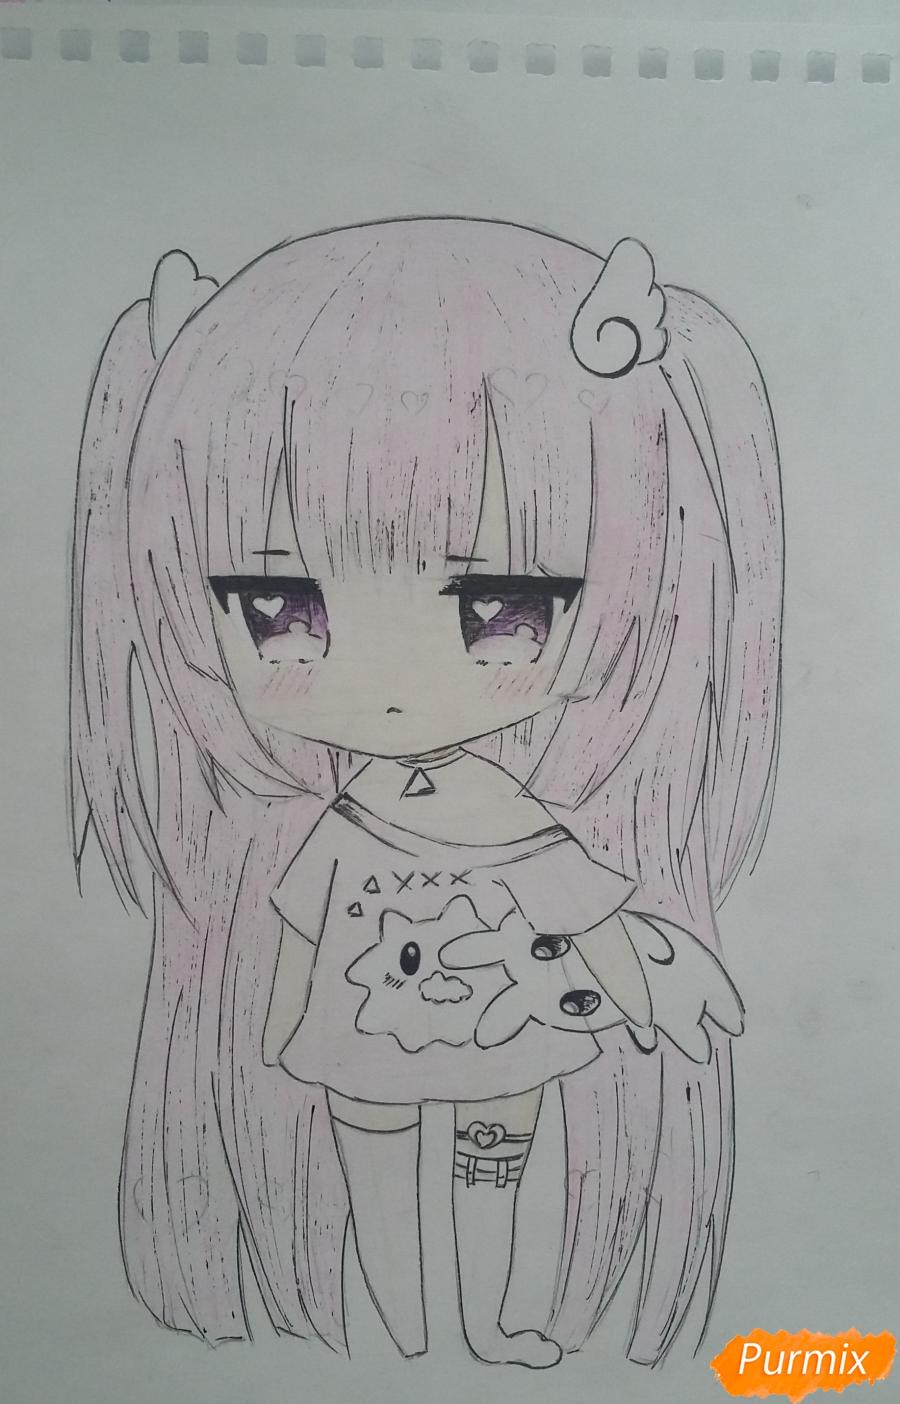 Рисуем милую чиби-тян в пижаме и игрушкой в руке карандашами - шаг 14